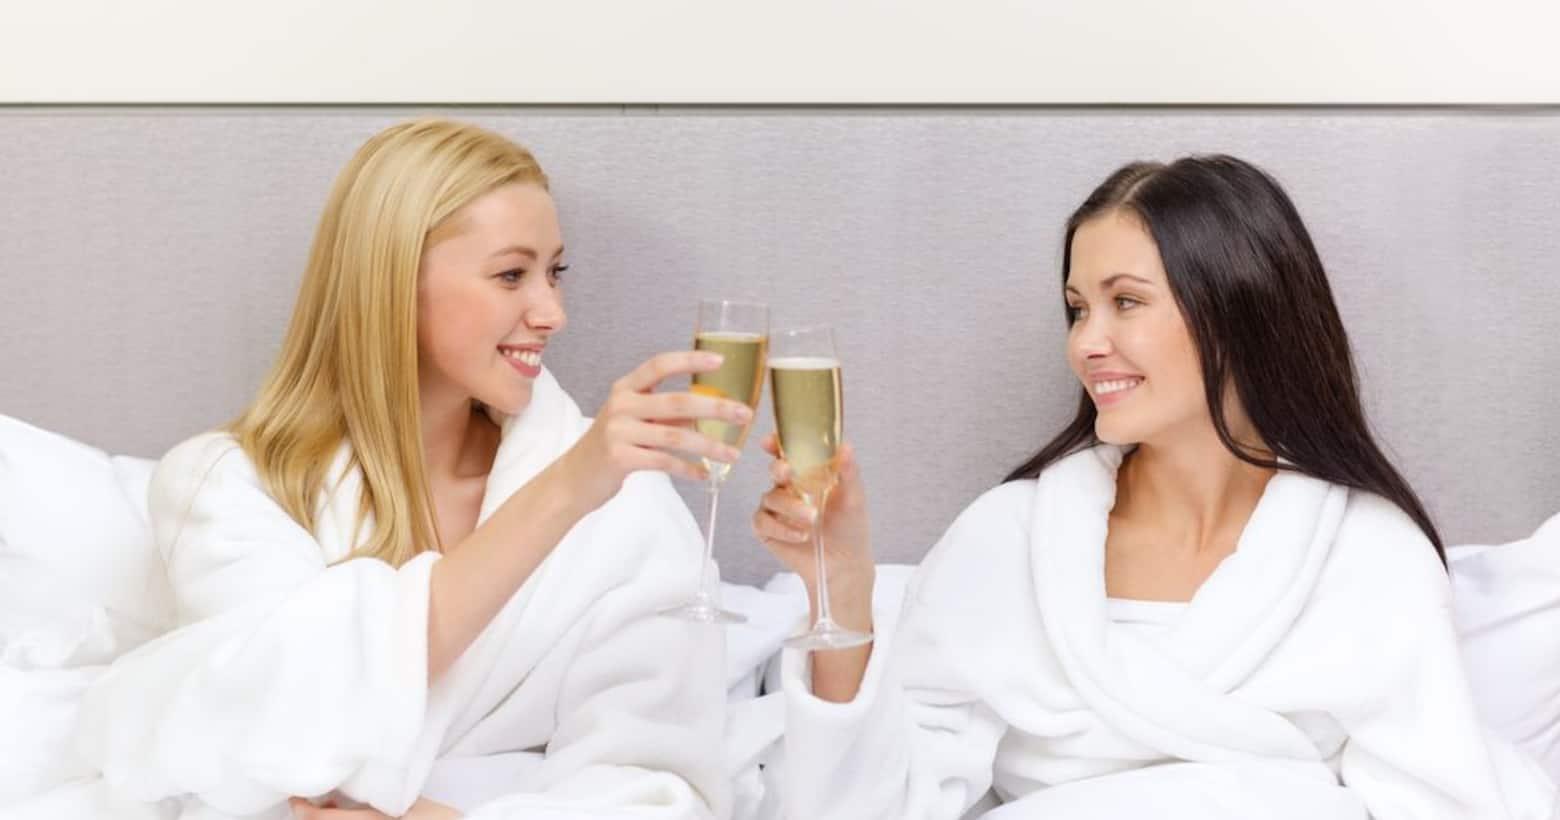 girls toasting champagne